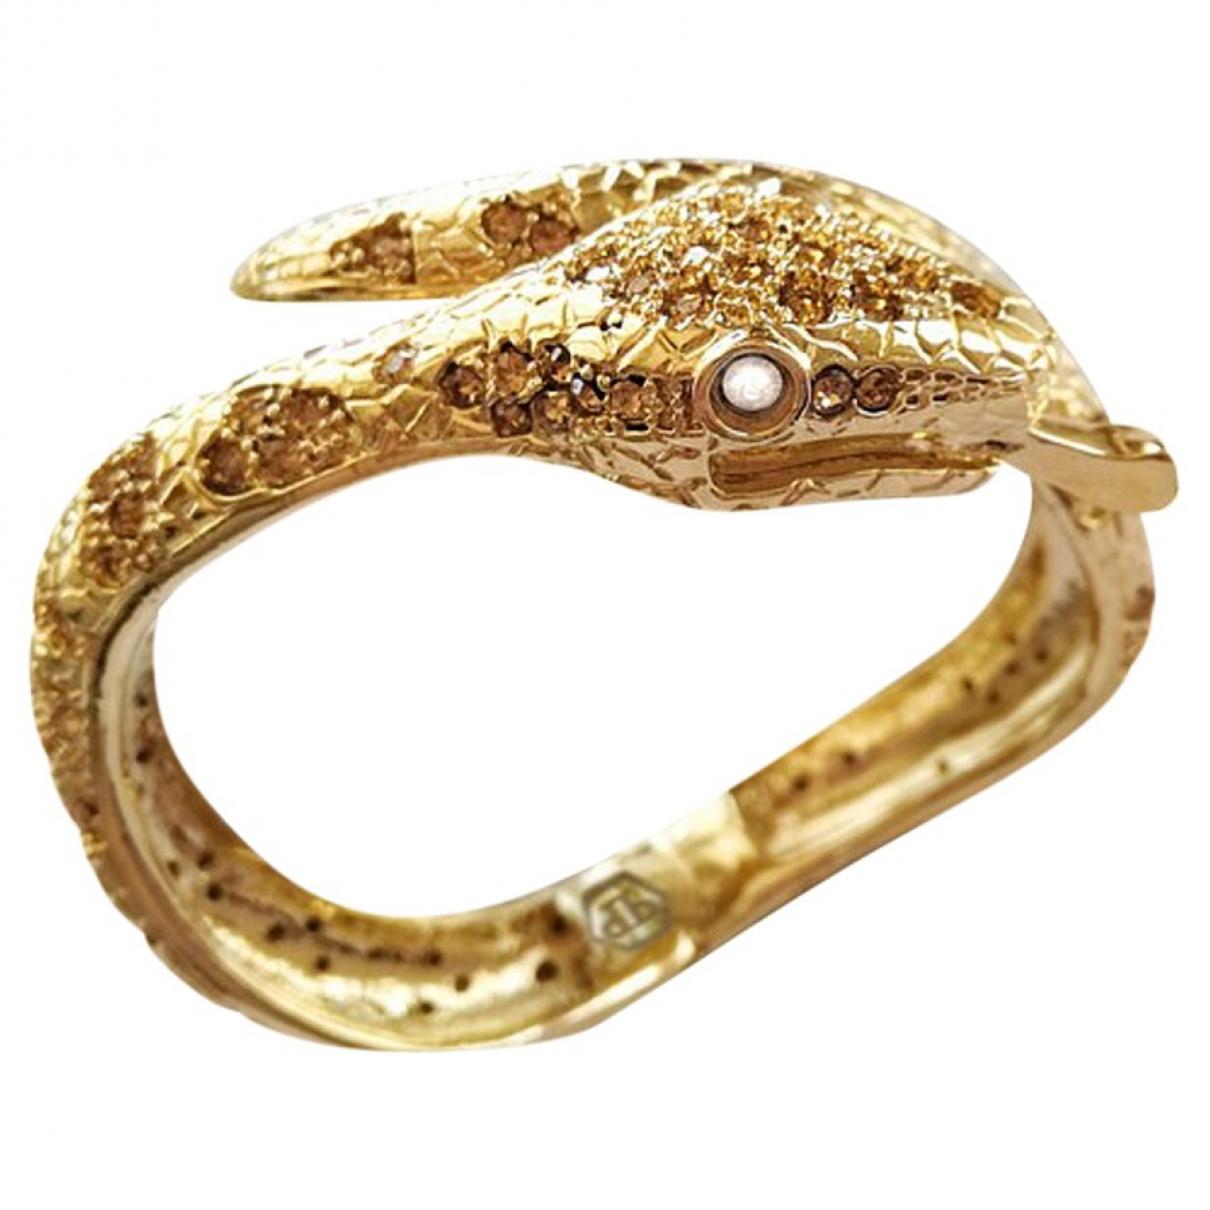 Philipp Plein \N Gold Metal bracelet for Women \N